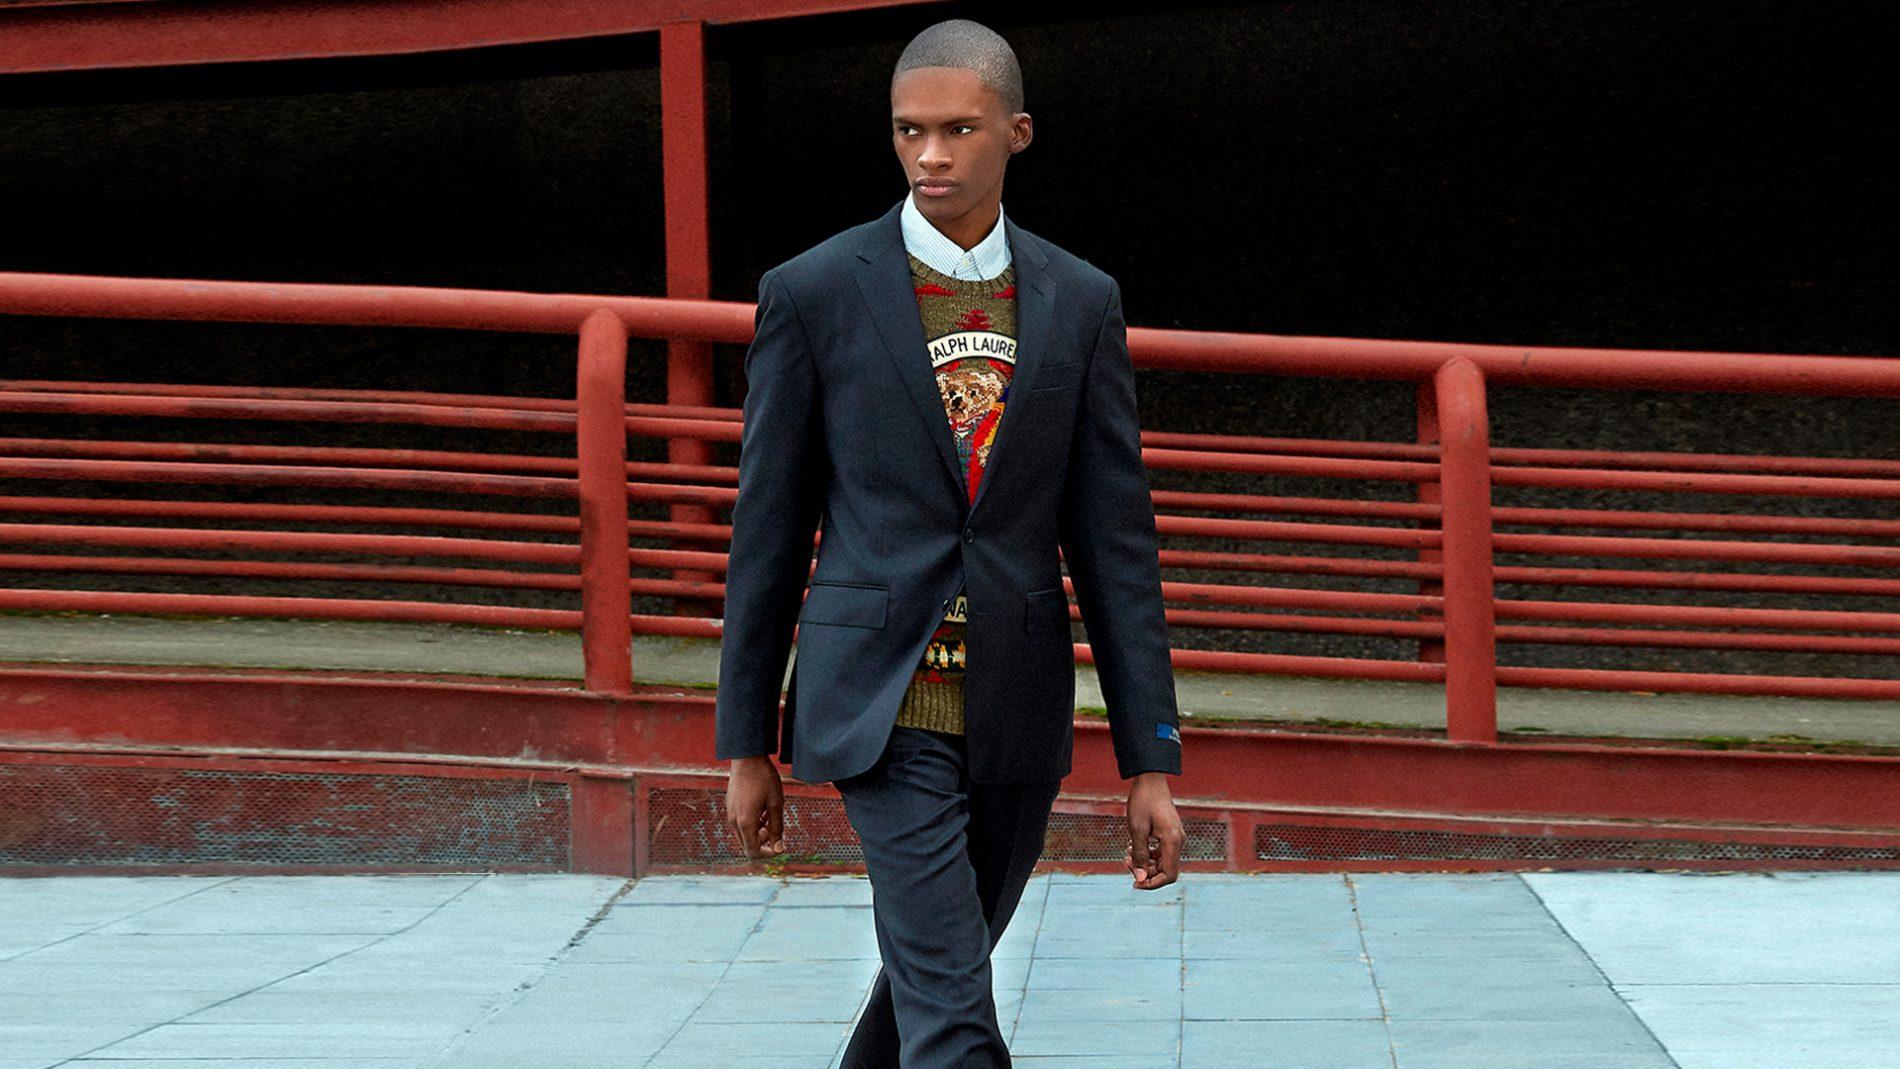 El Corte Inglés Designer Menswear Tailored Clothing Ralph Lauren